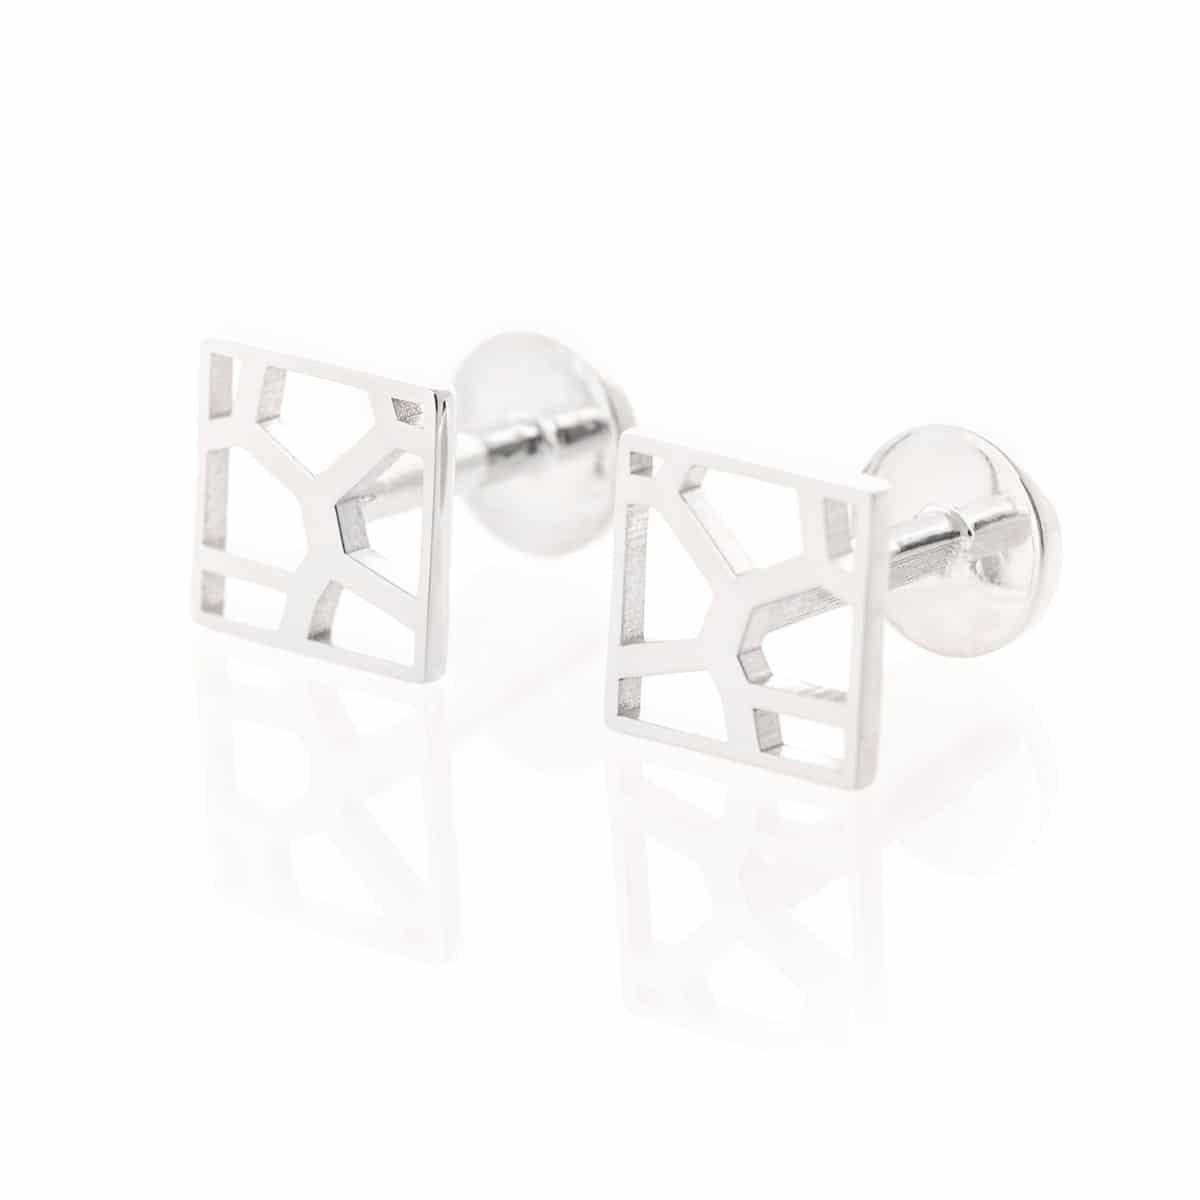 11-Vornoi-cufflinks-square-silver-1200px